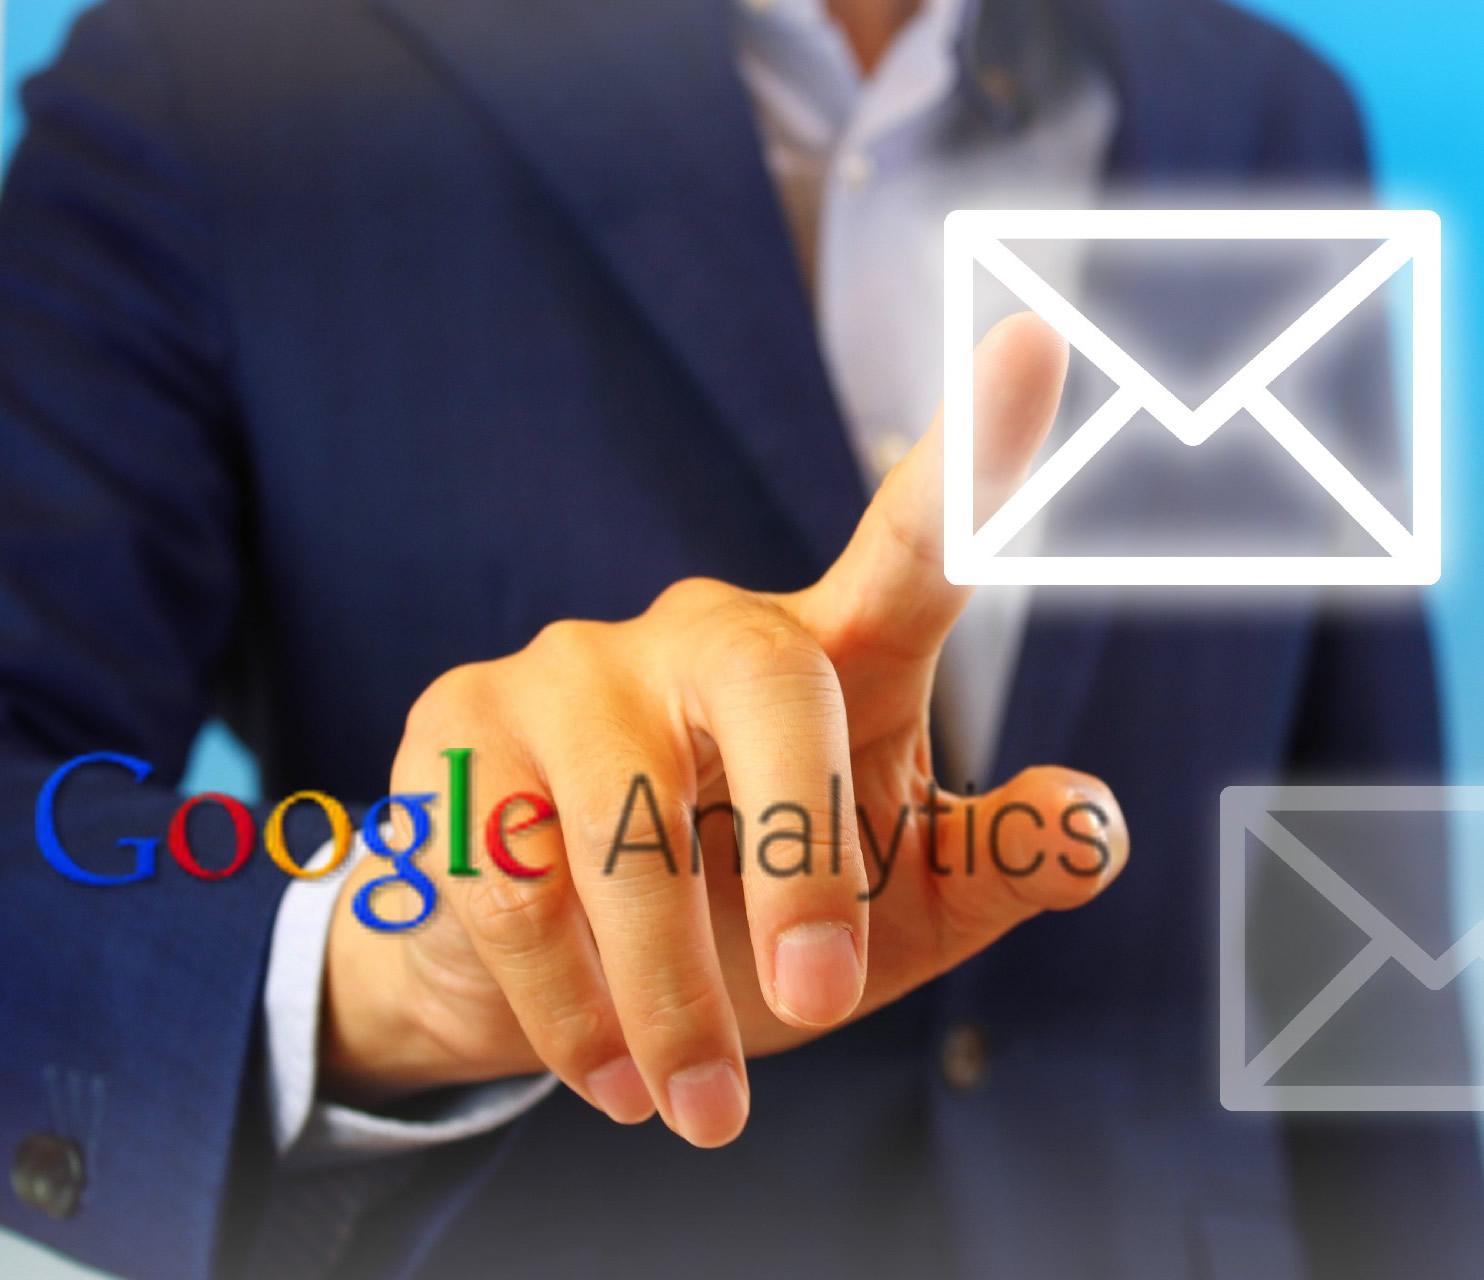 GoogleAnalyticsでメールからのクリック数を確認する方法